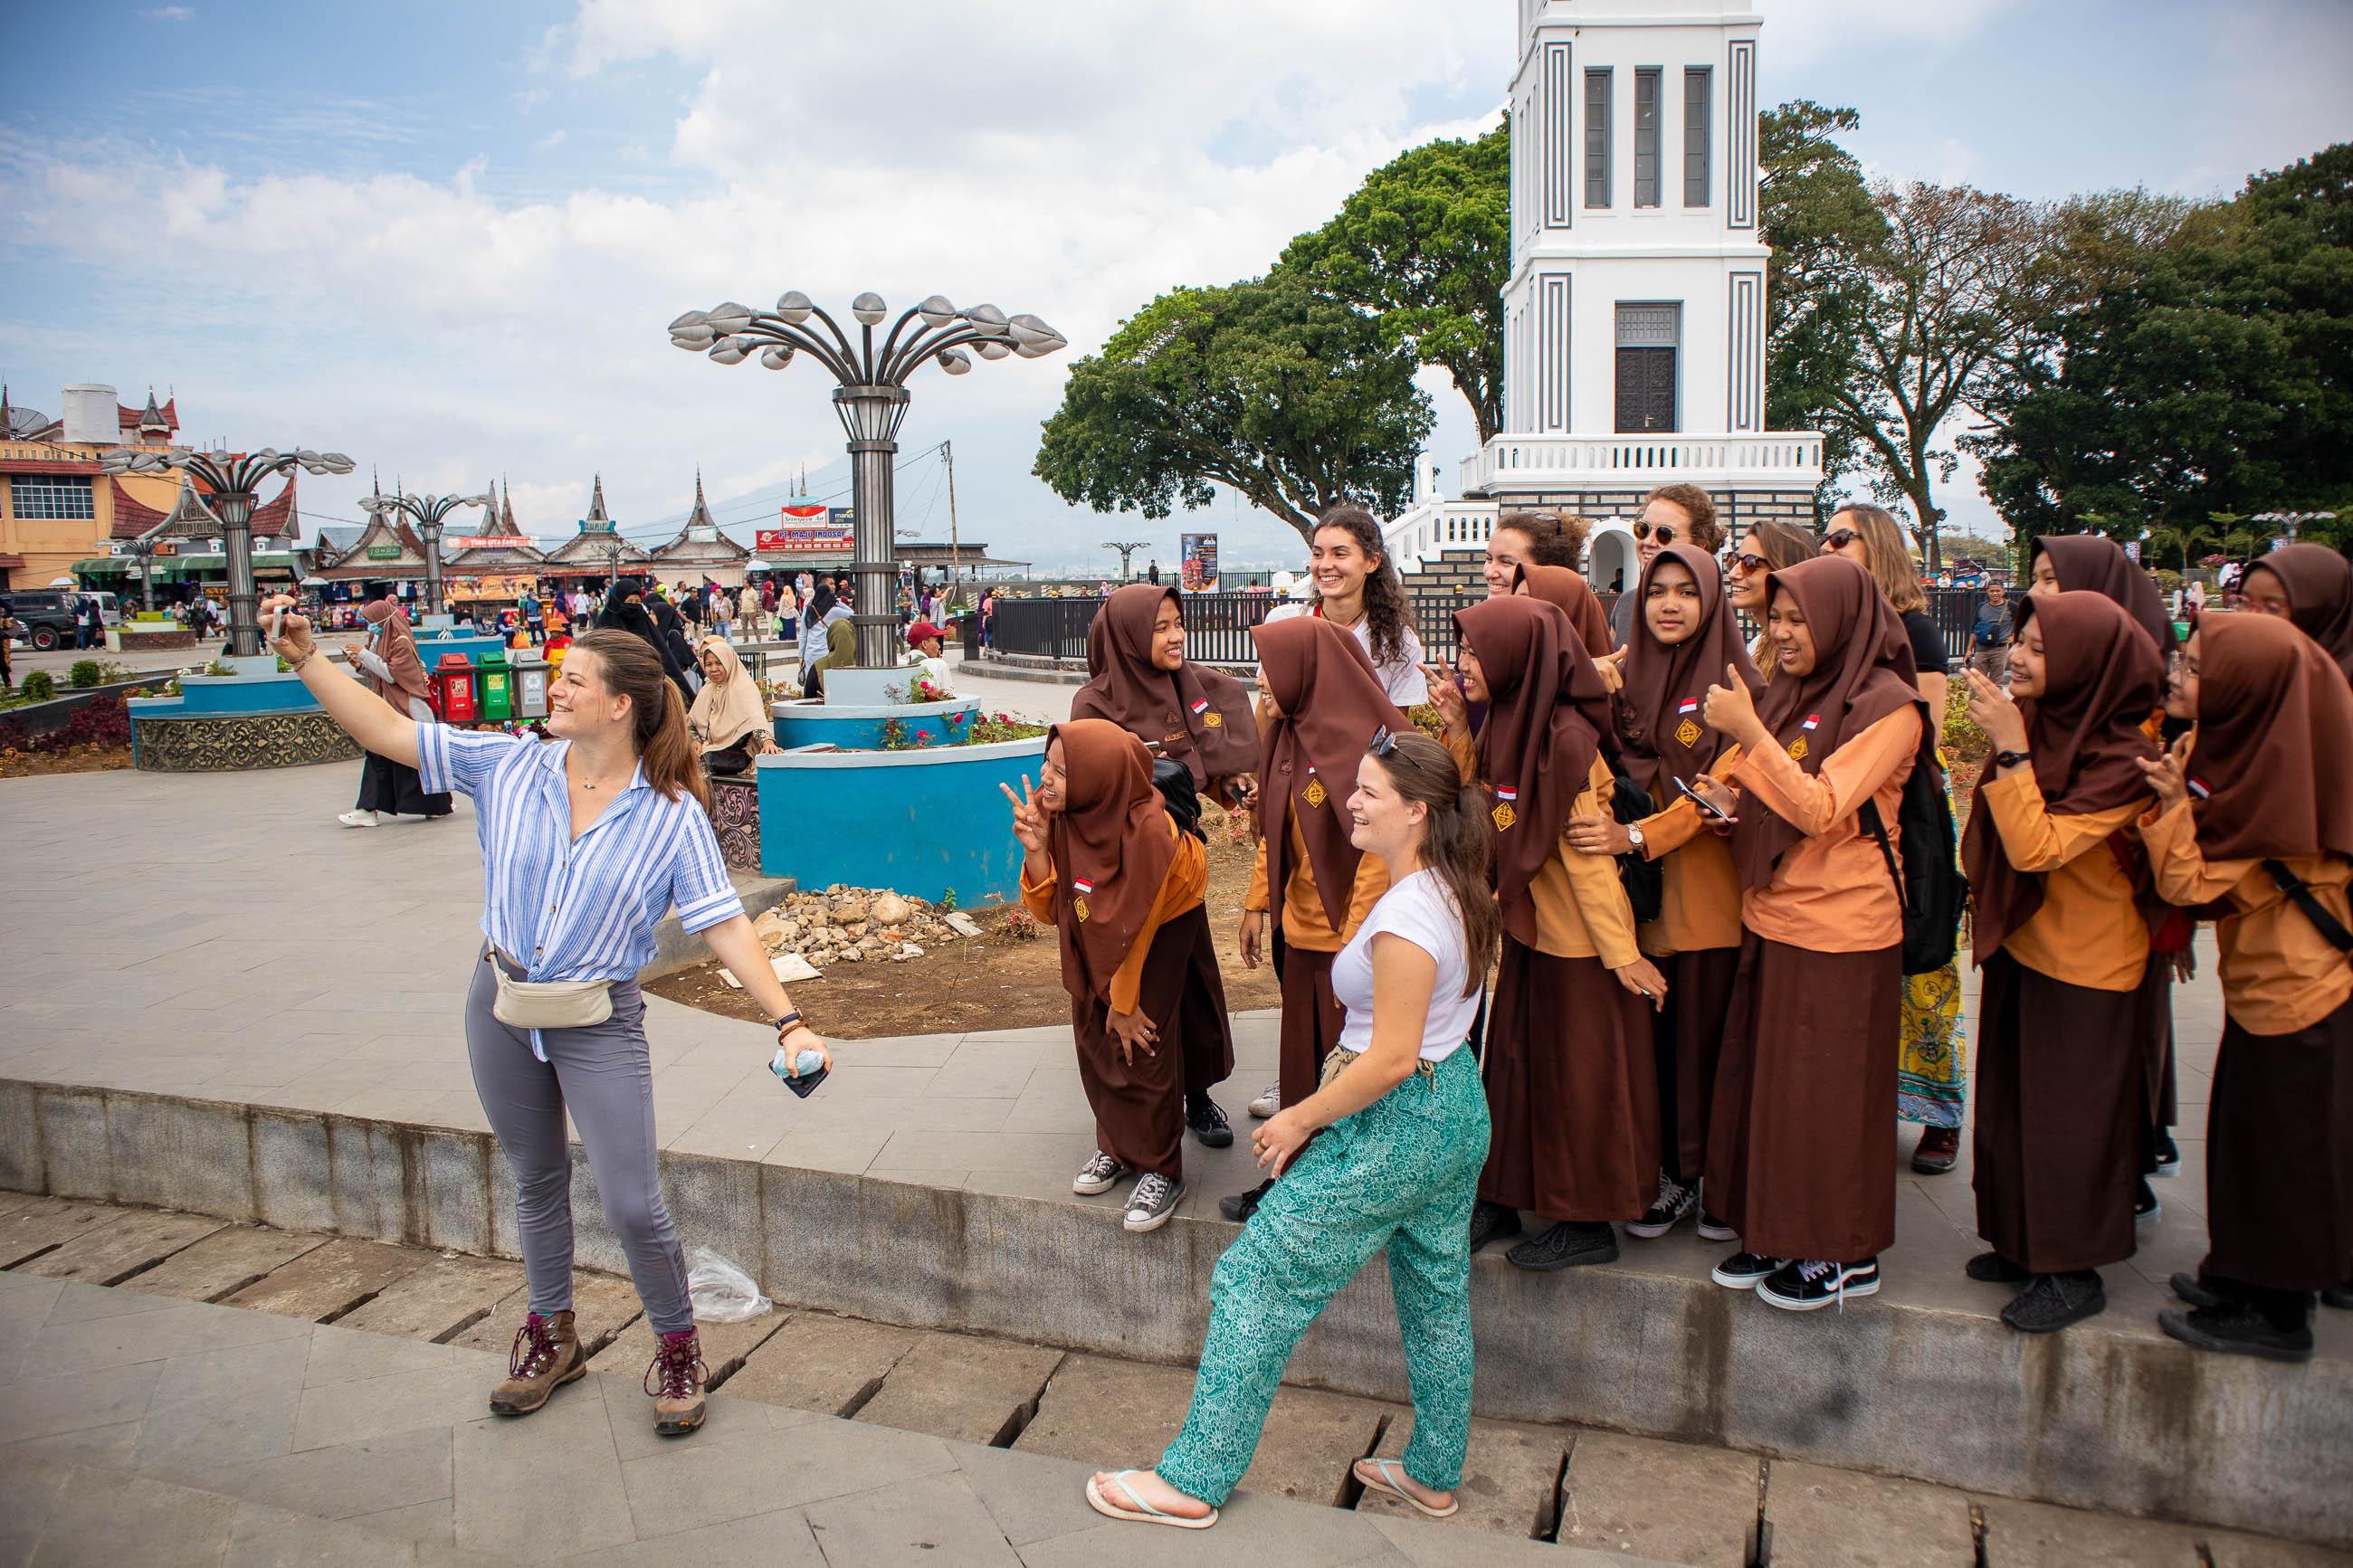 https://bubo.sk/uploads/galleries/7396/tomashornak_indonezia_sumatra_img_0270-1-8.jpg